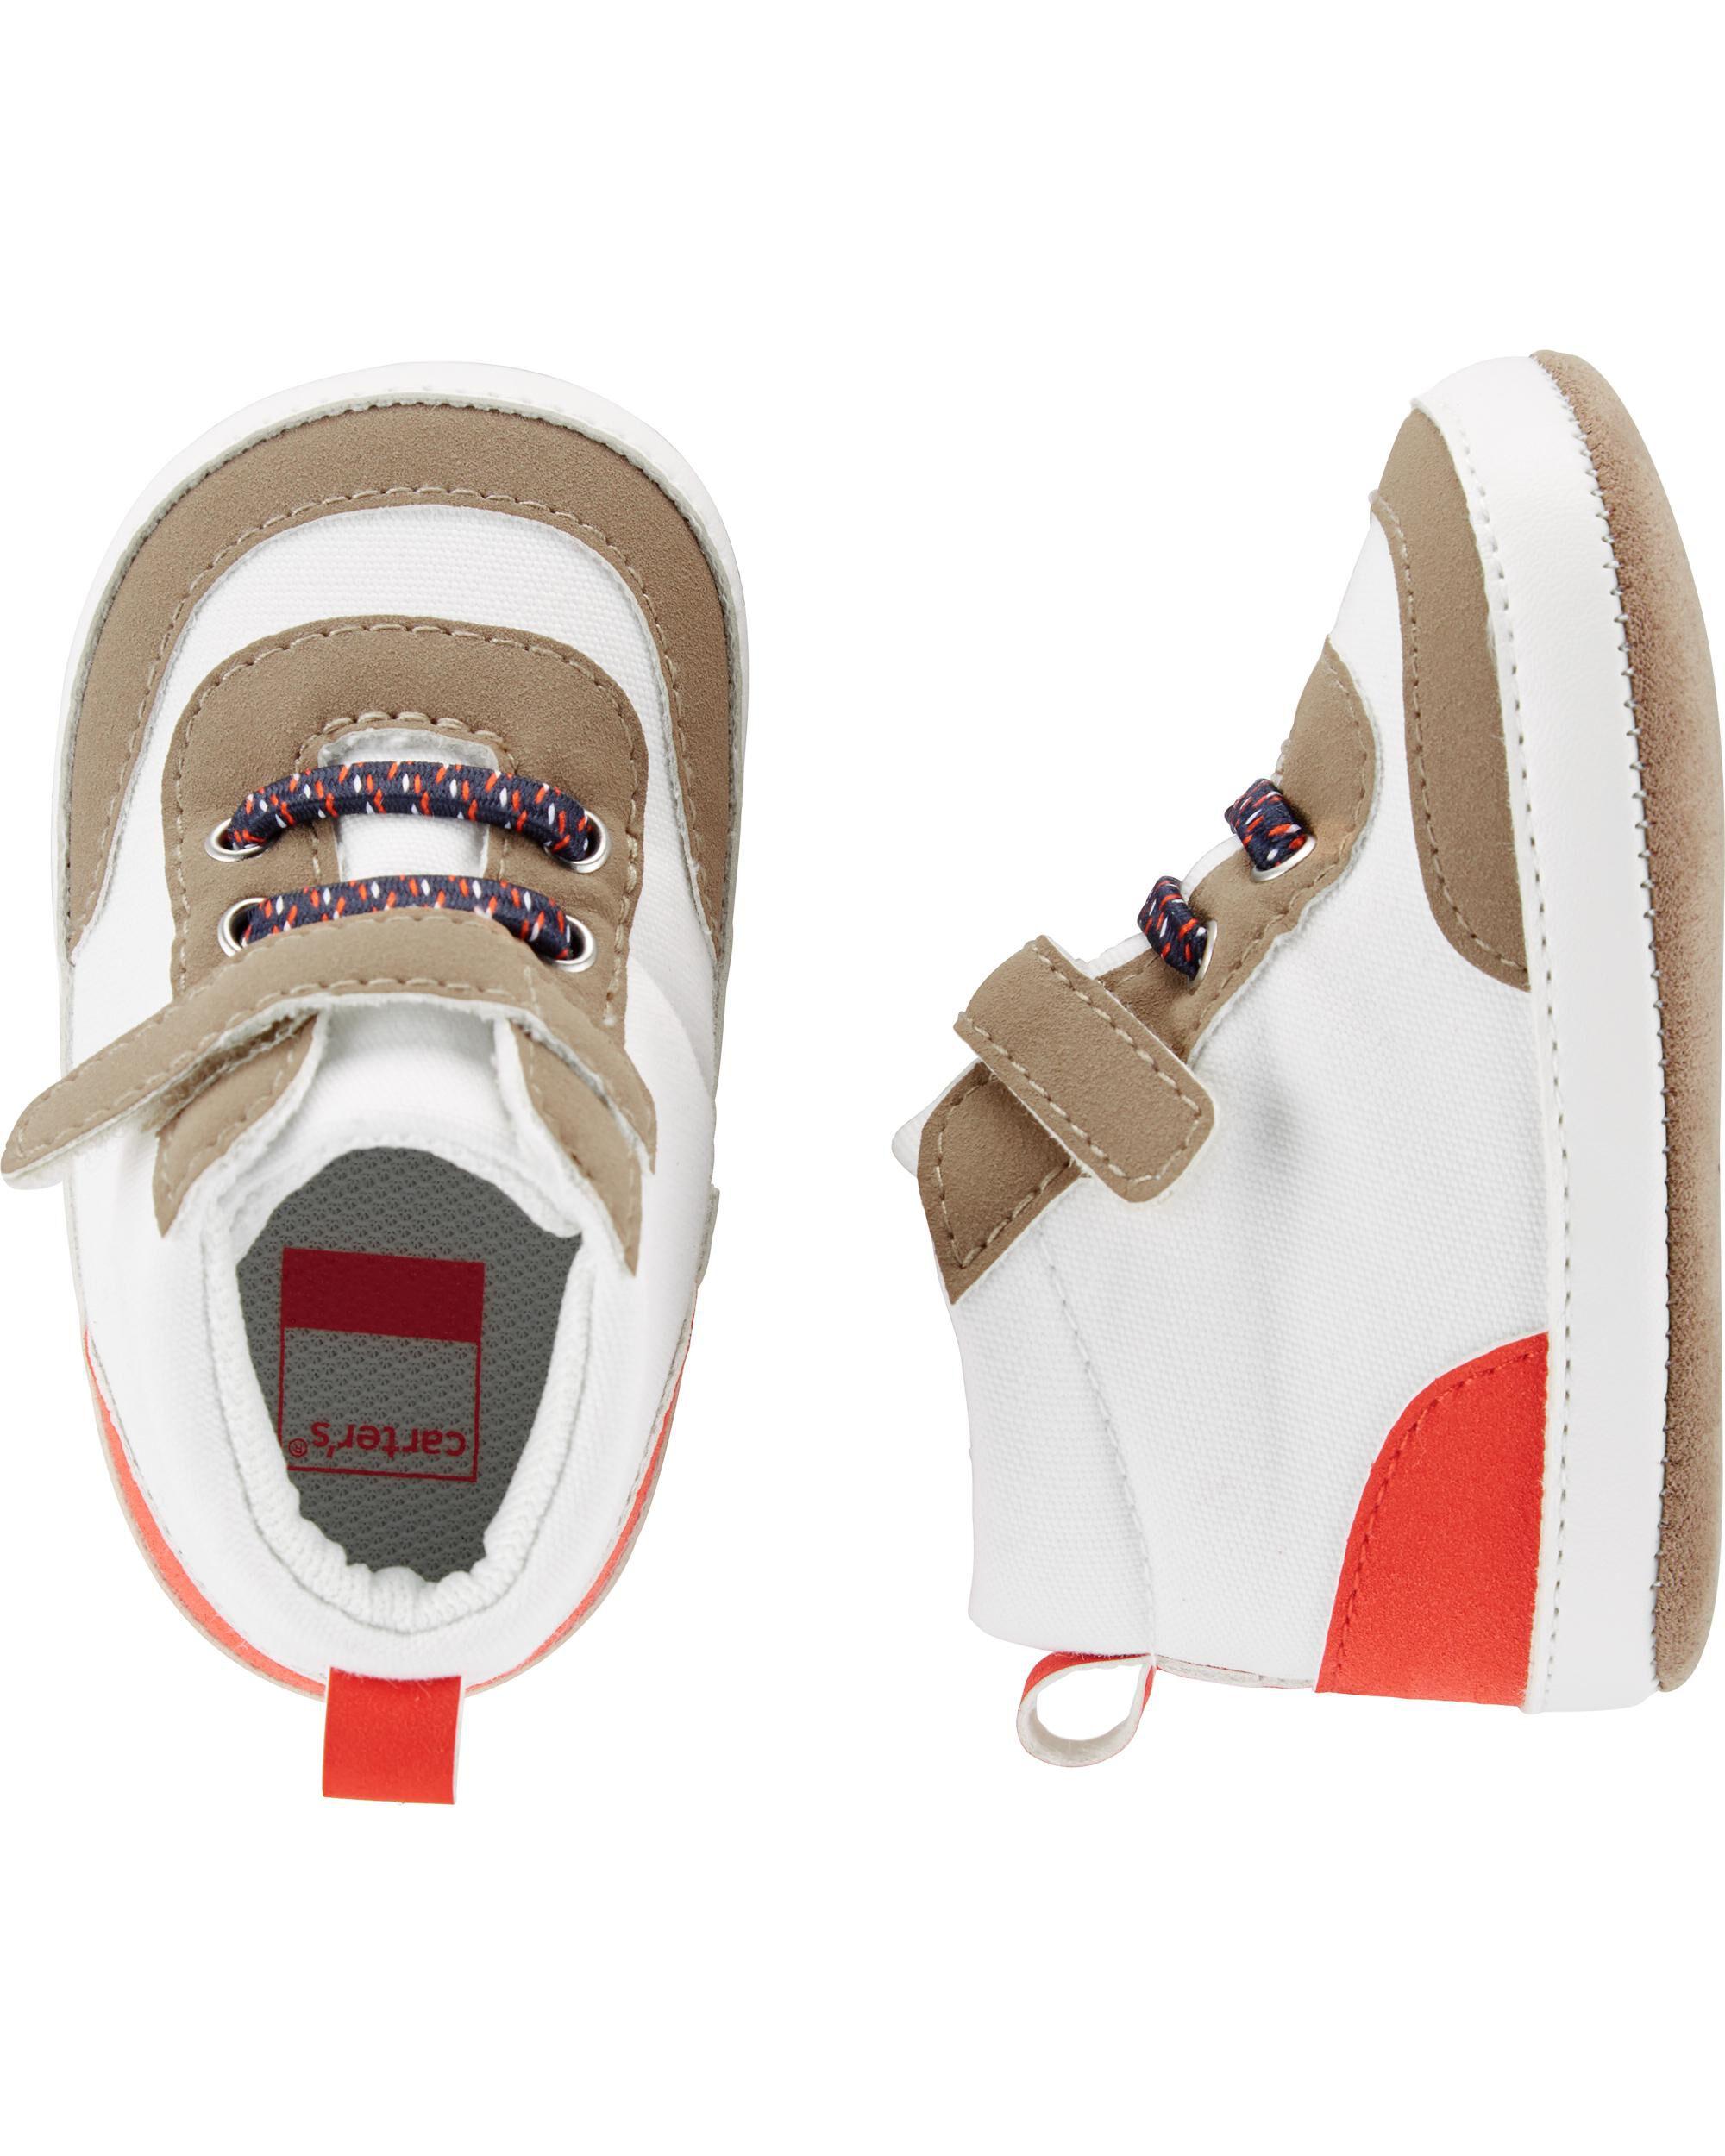 carters baby sneakers